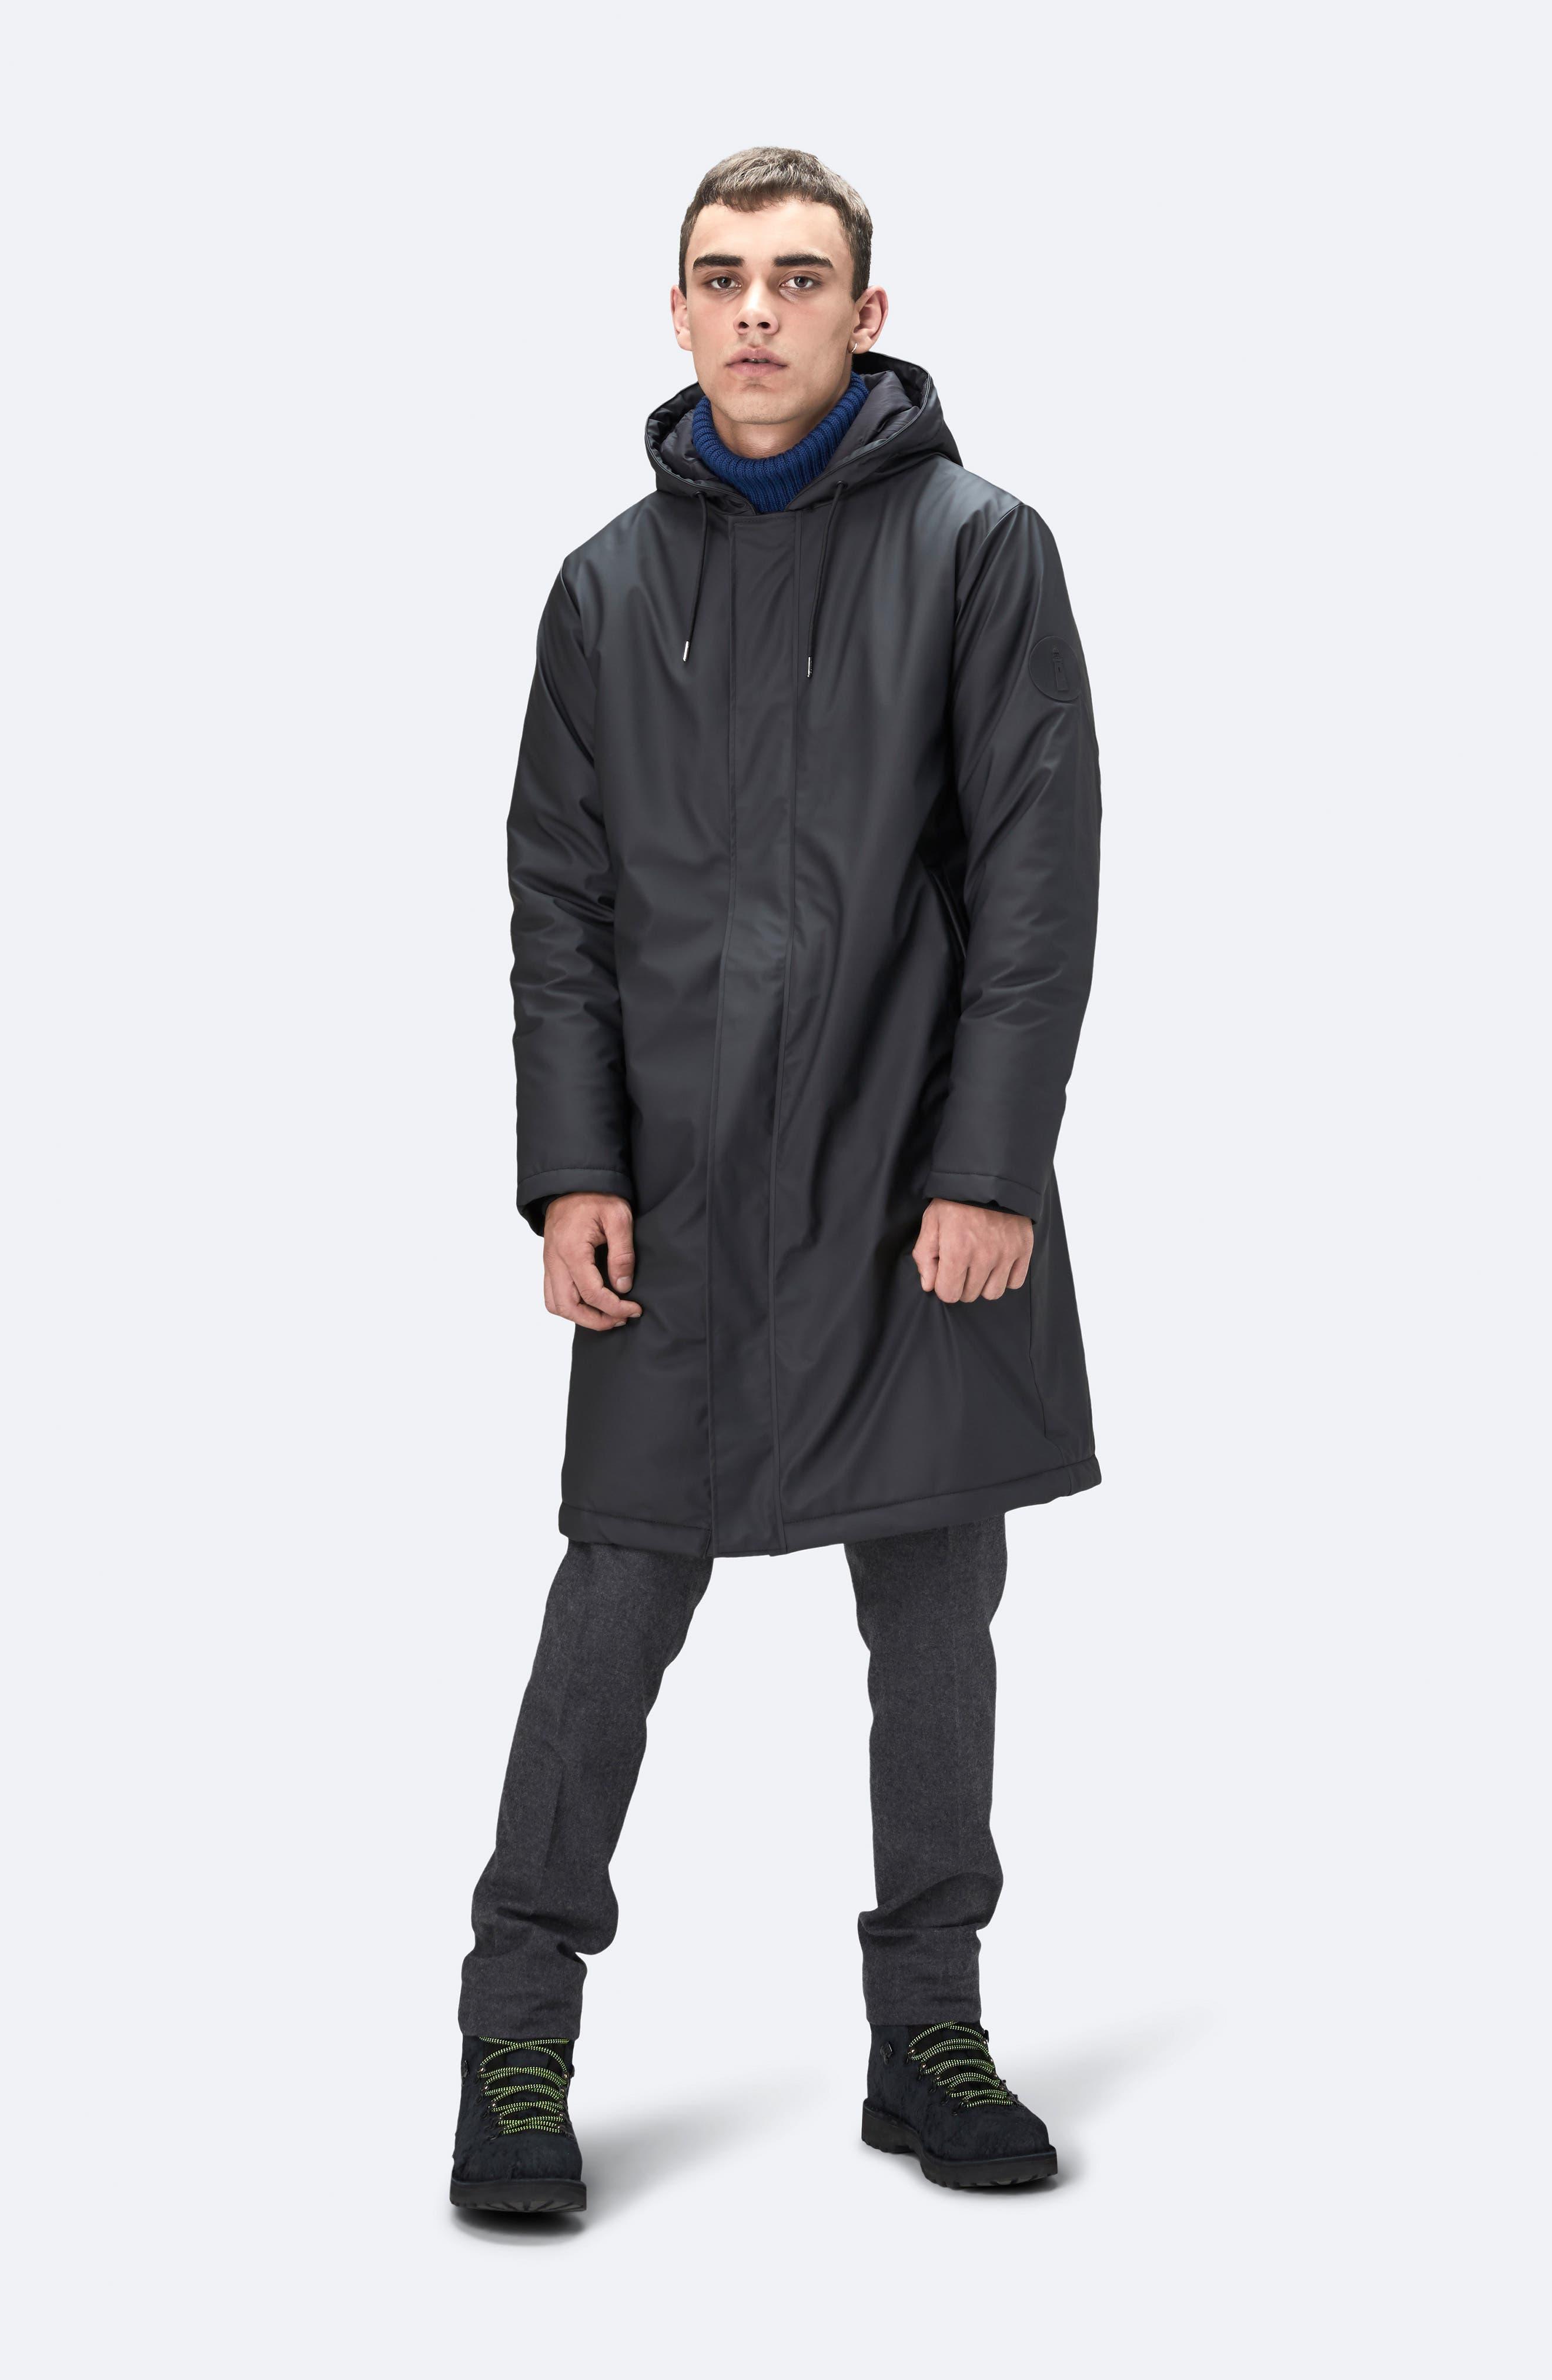 Thermal Hooded Raincoat,                             Alternate thumbnail 10, color,                             BLACK